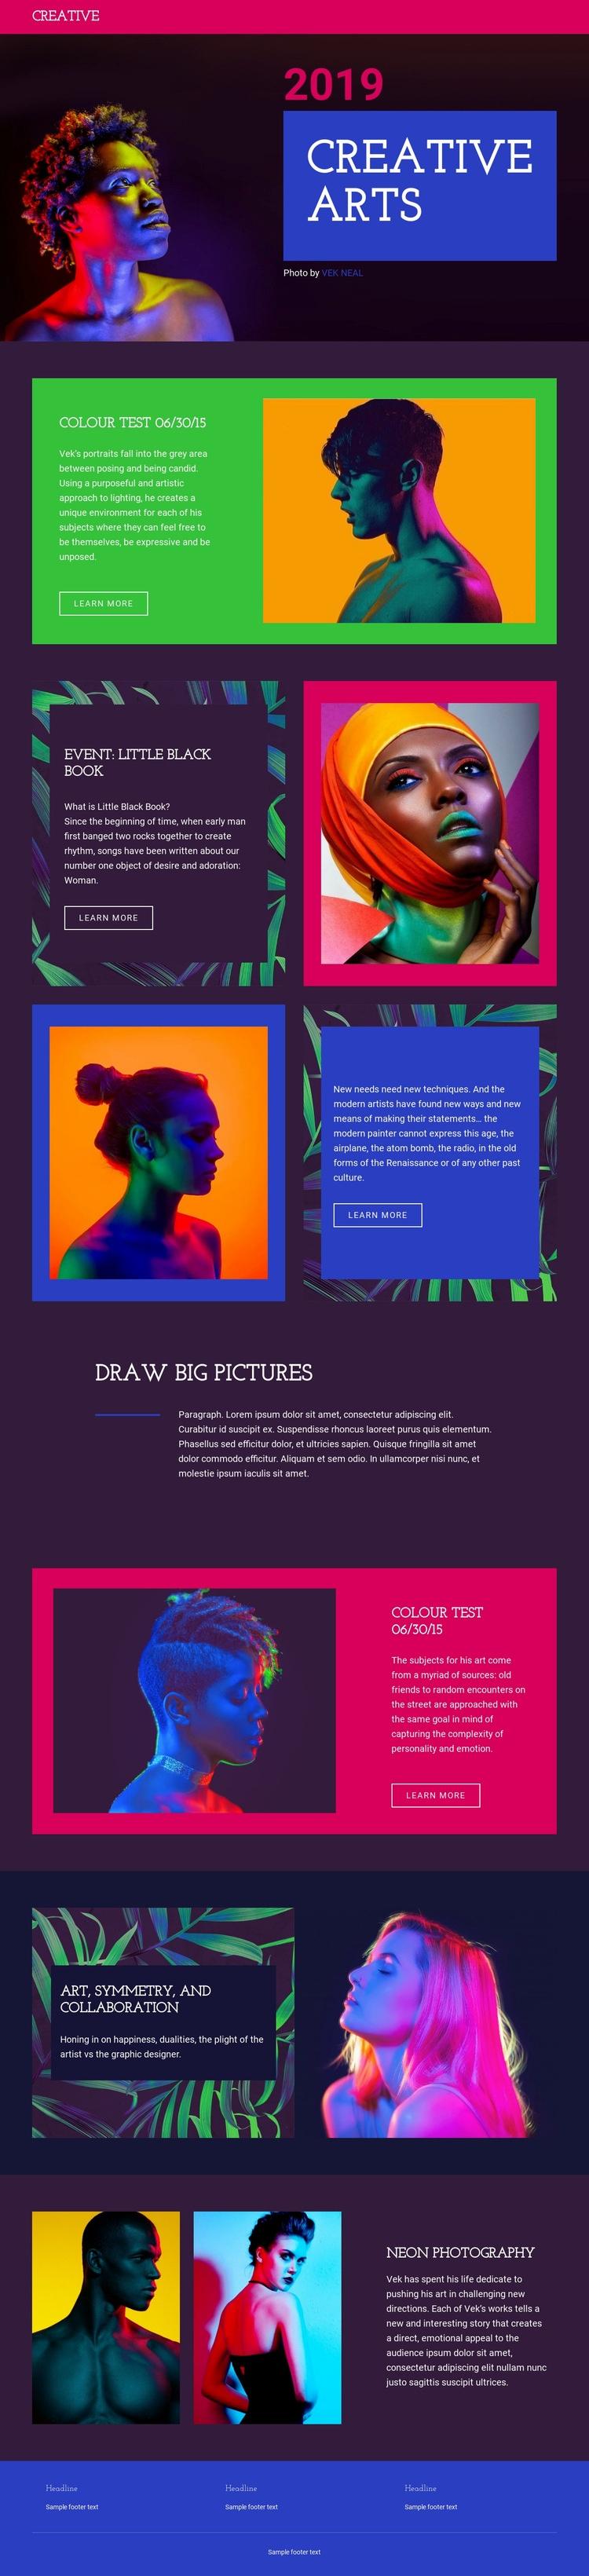 Creative Arts Html Code Example